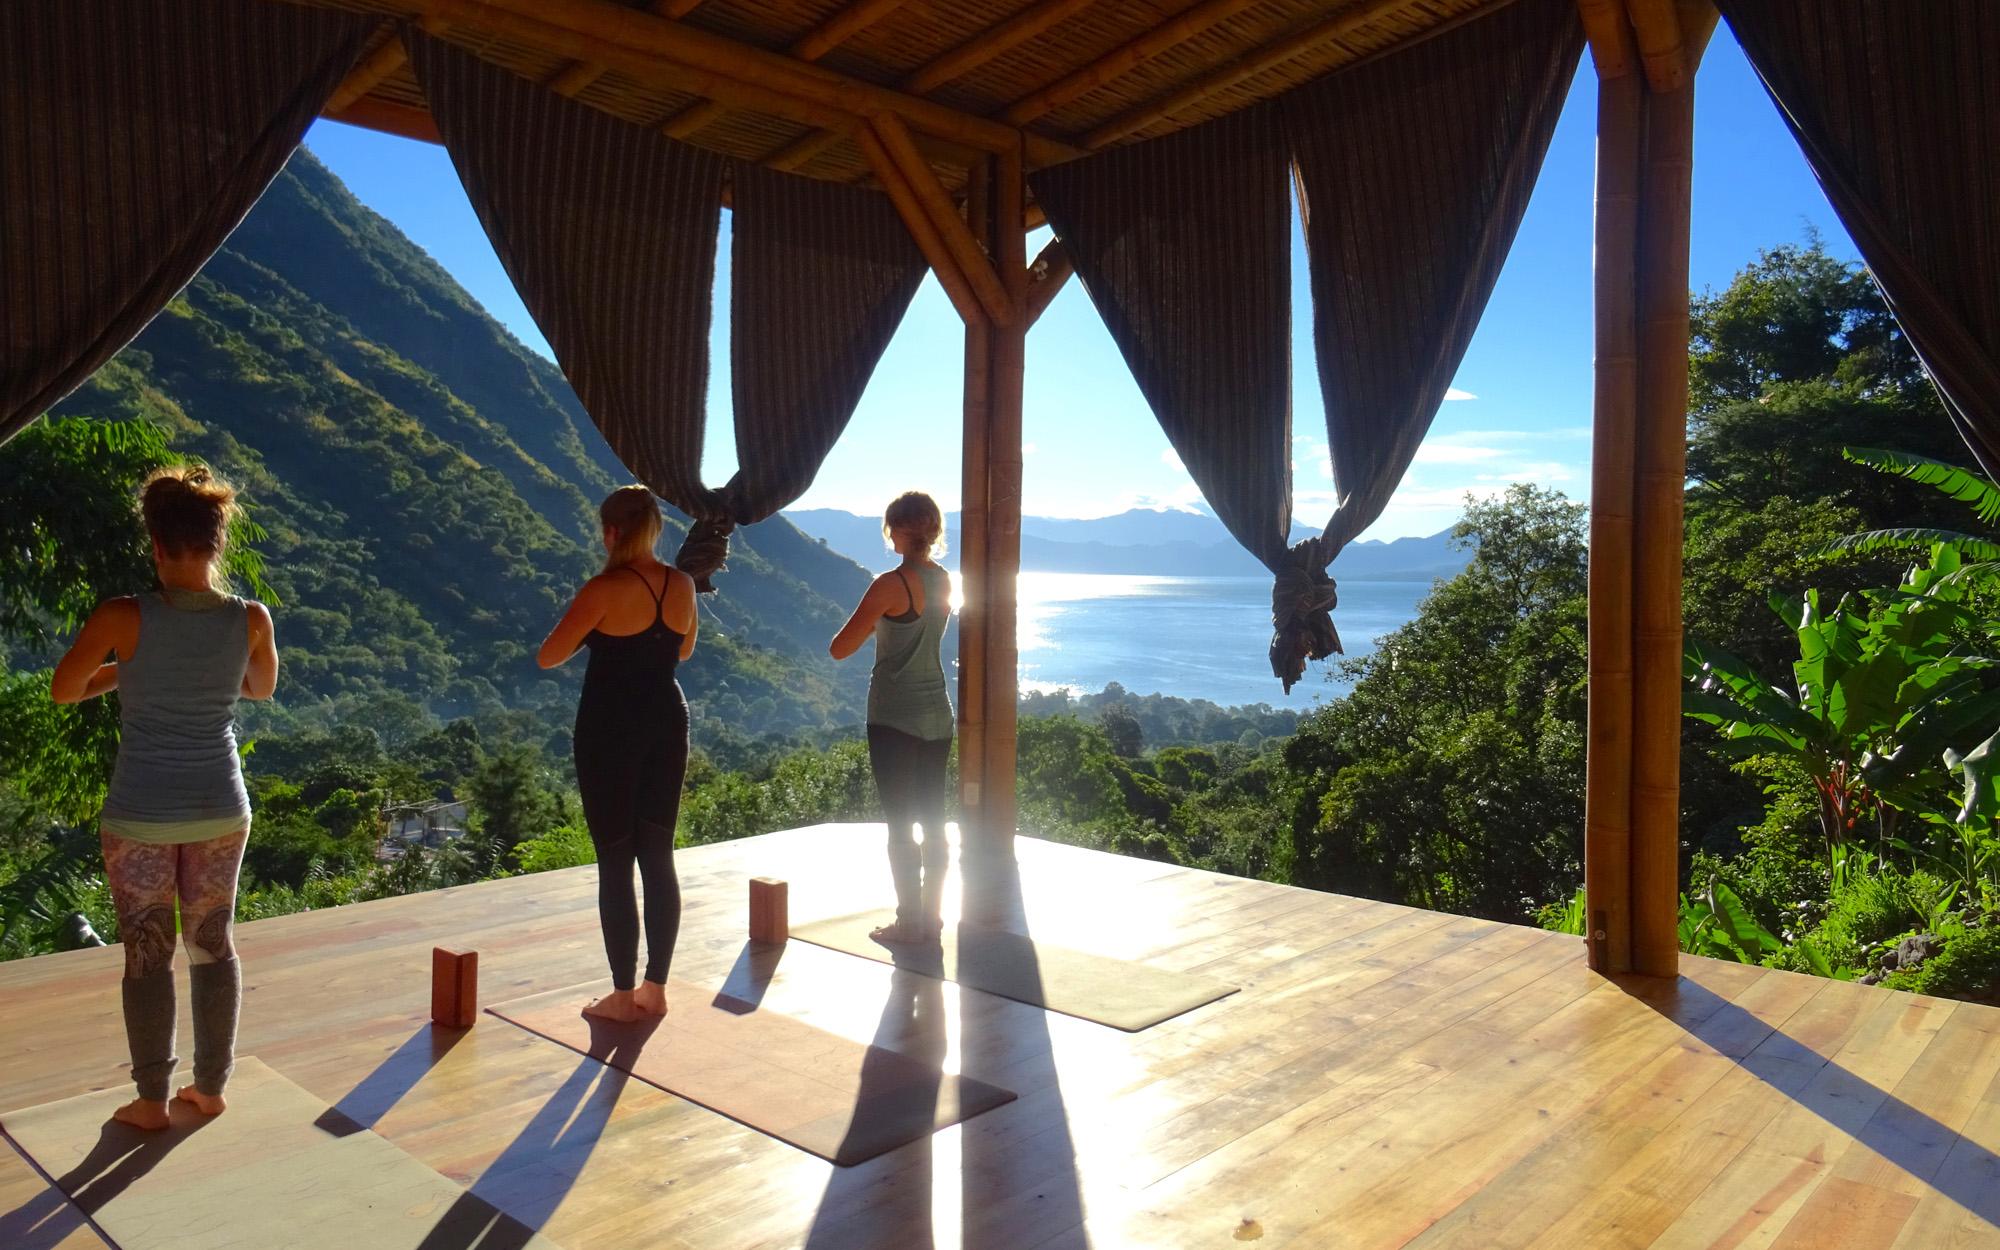 5_Yoga_deck_Bamboo_house.JPG